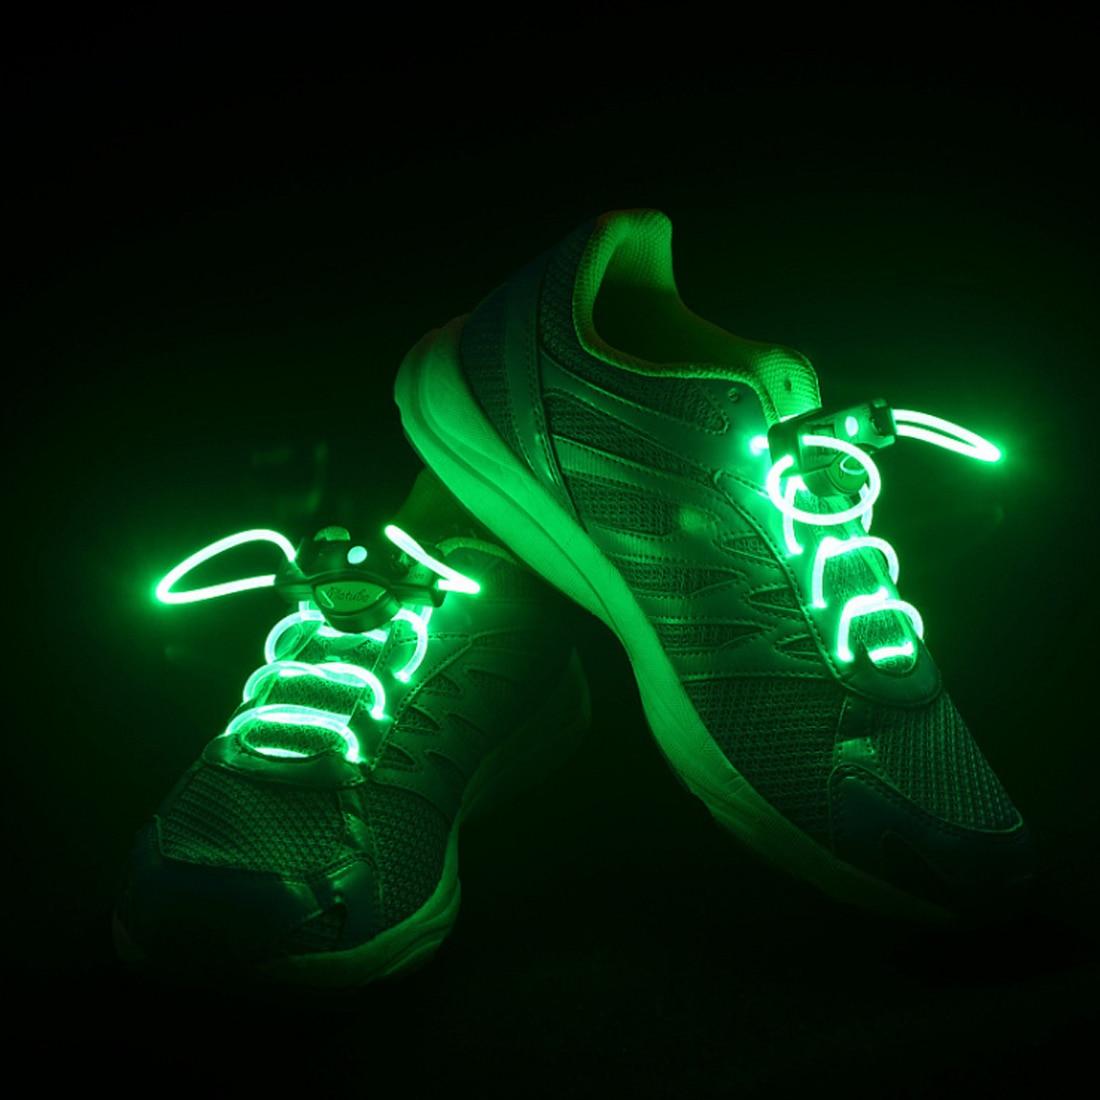 Hot  2pcs! Fashion LED Shoelaces Shoe Laces Flashing Light Up Glow Stick Strap Neon Shoe Strings Luminous Laces Disco Party